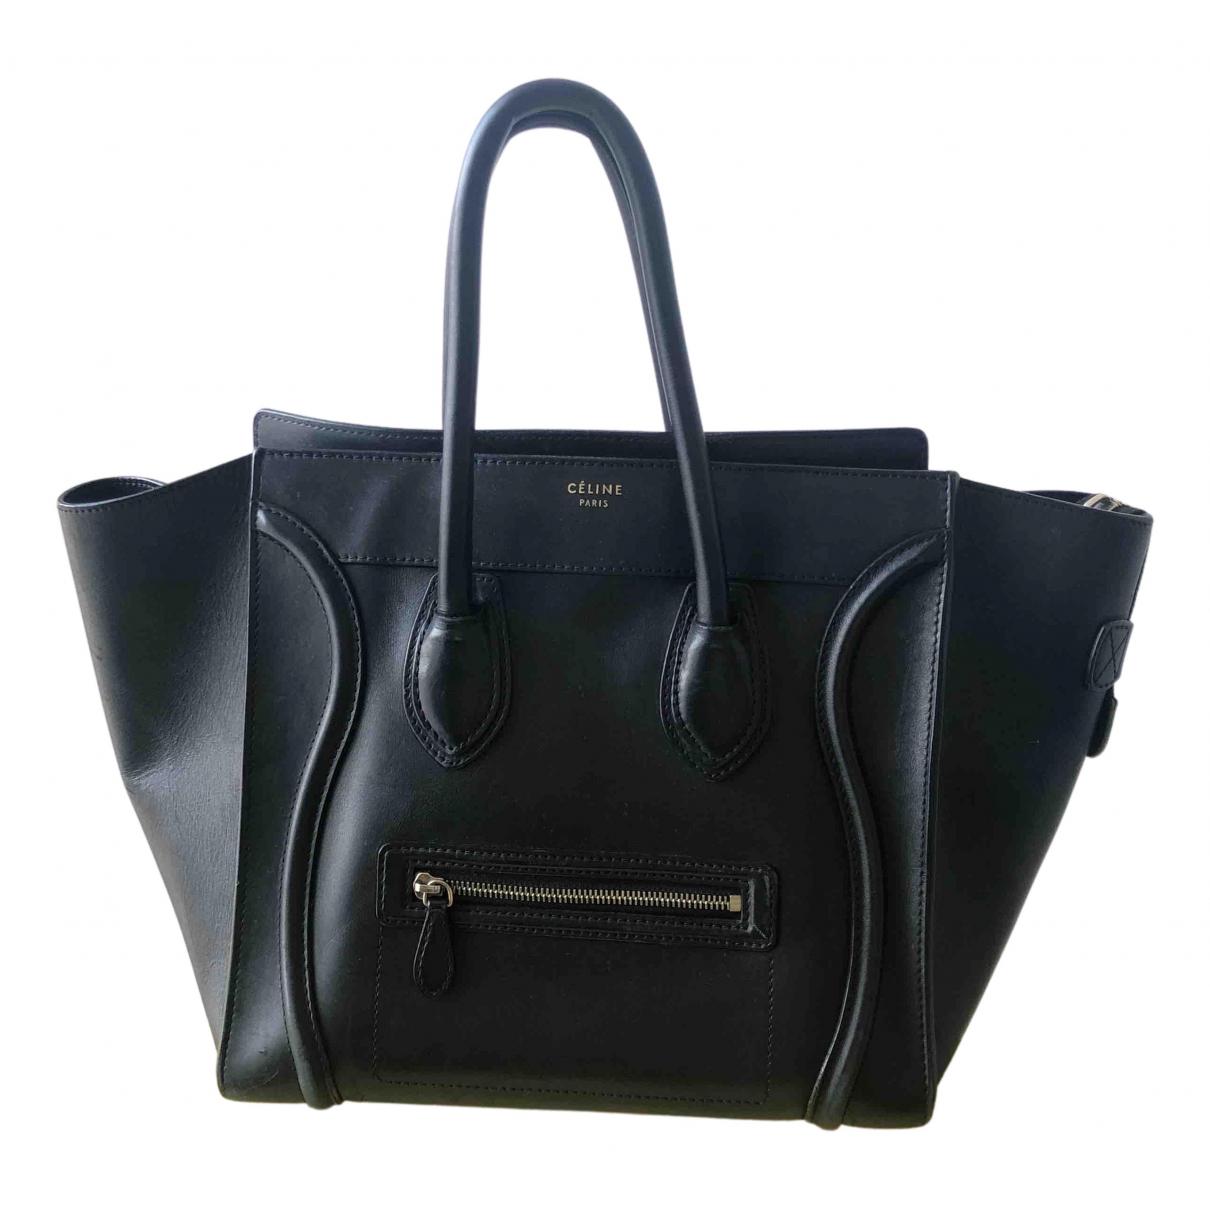 Celine Luggage Black Leather handbag for Women N